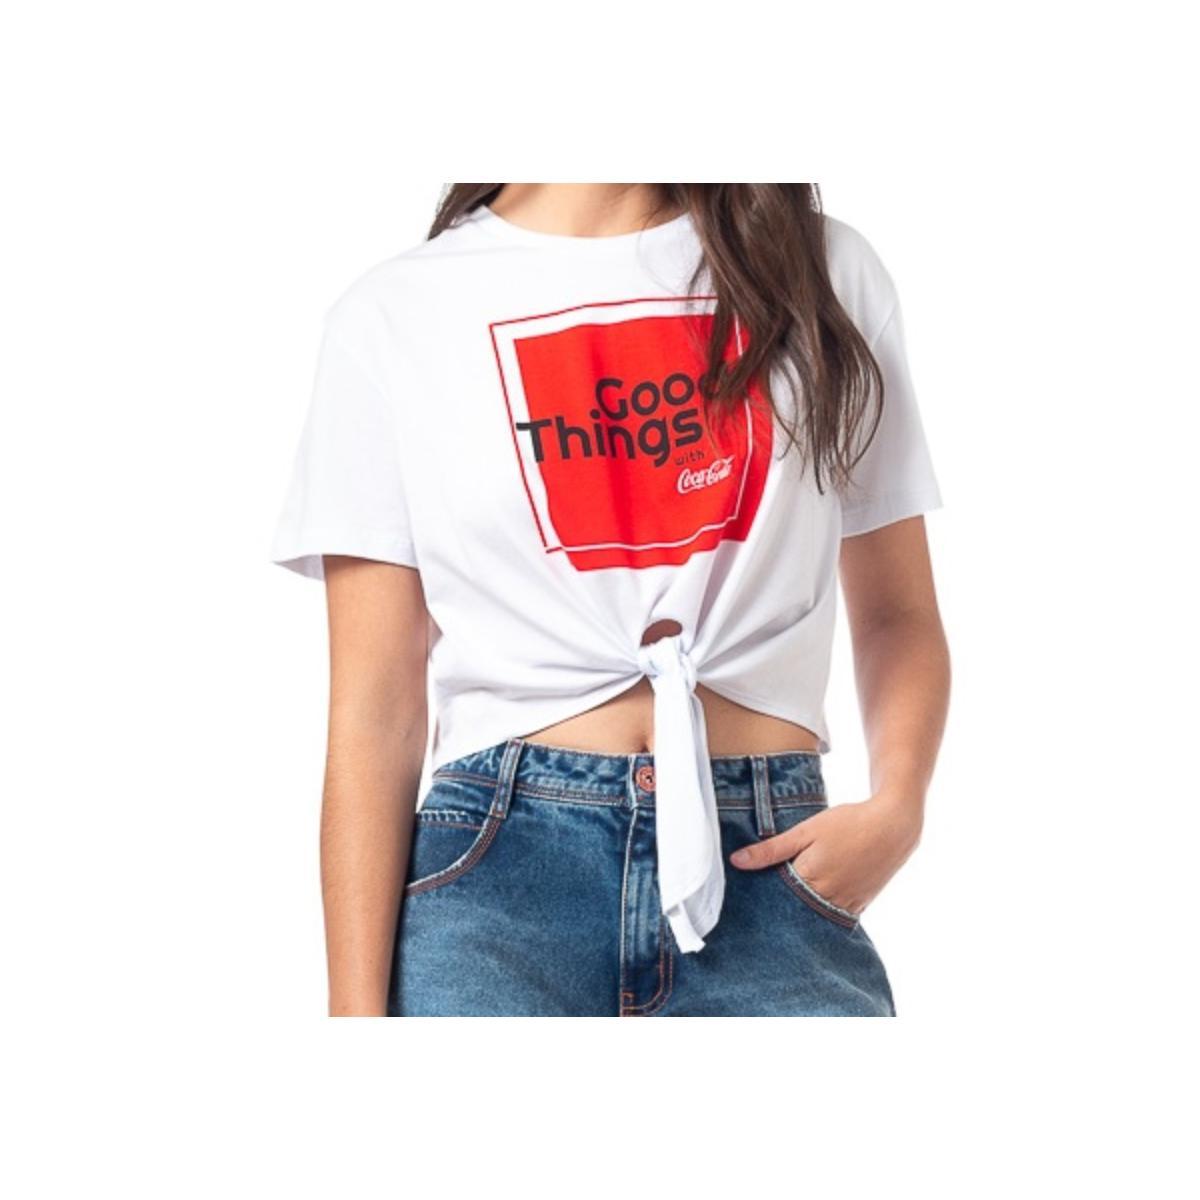 Blusa Feminina Coca-cola Clothing 343203188 0001 Branco